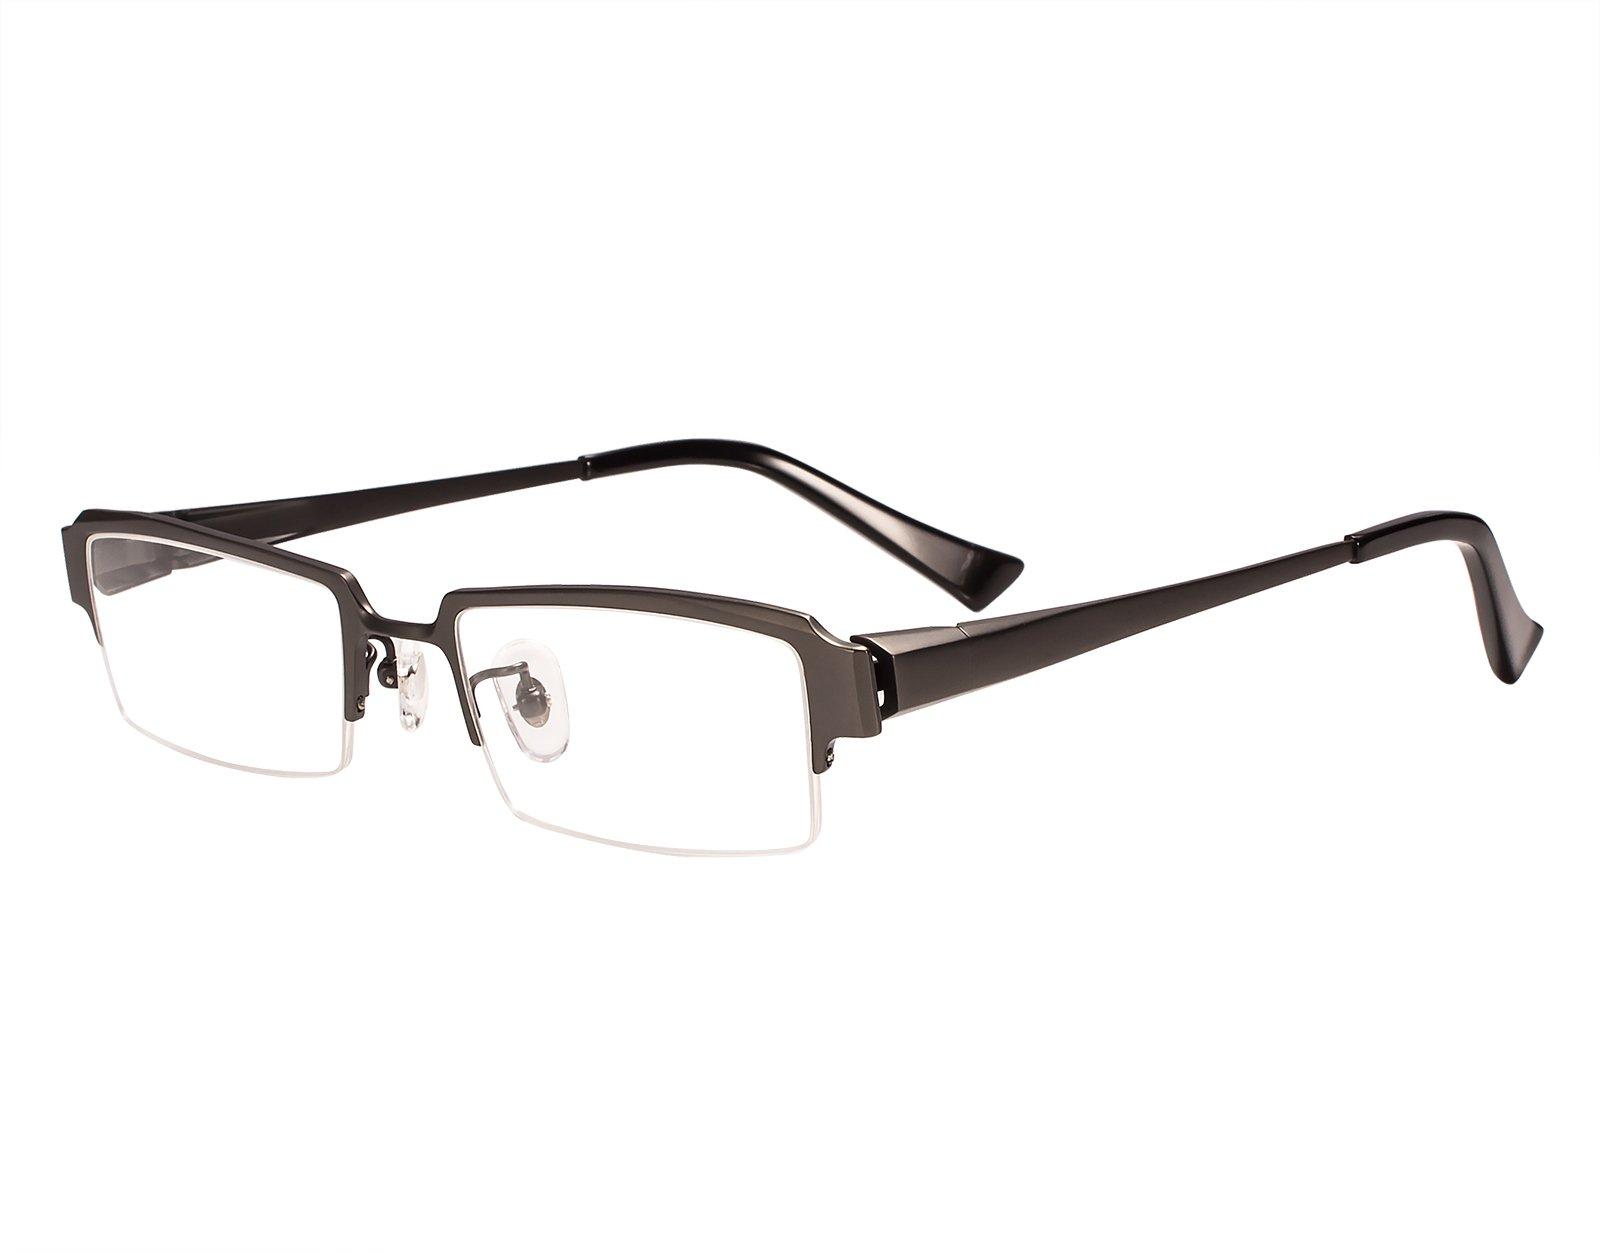 Agstum Pure Titanium Half Rim Optical Business Glasses Frame Clear Lens Rx (Gunmetal, 52)